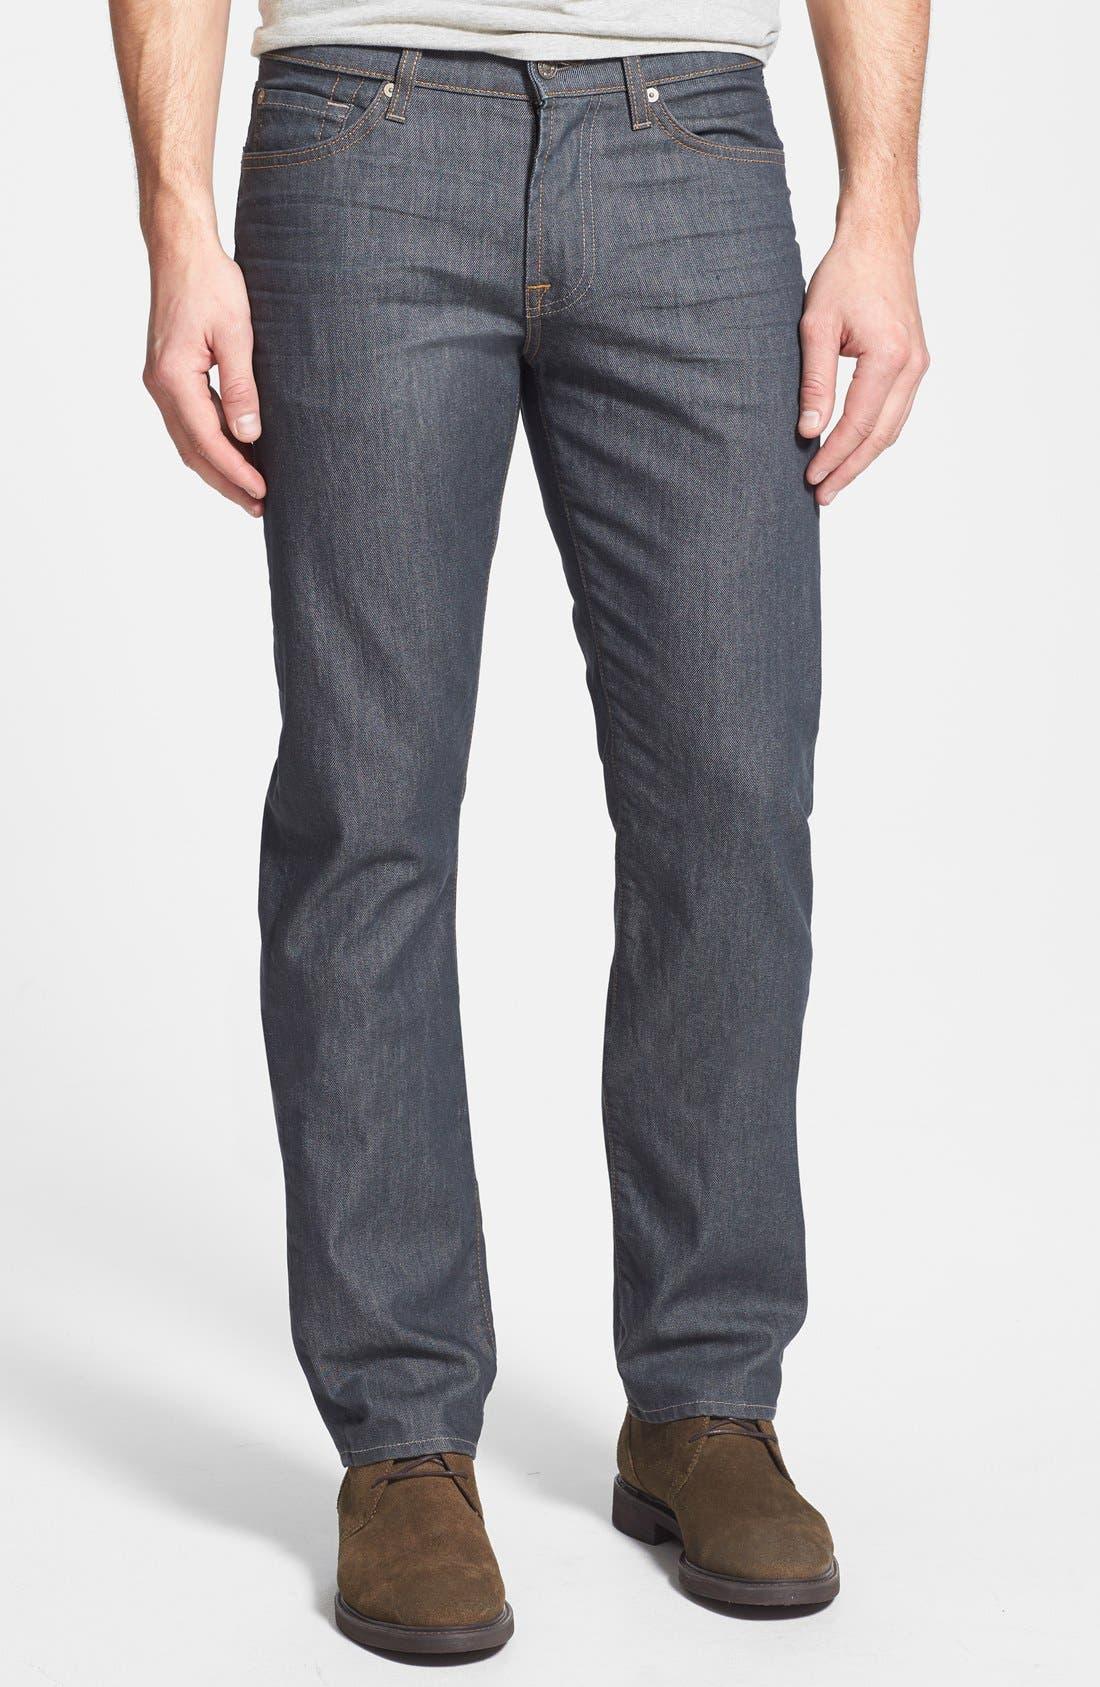 Alternate Image 1 Selected - 7 For All Mankind® 'Slimmy' Slim Straight Leg Jeans (Summer Haze)